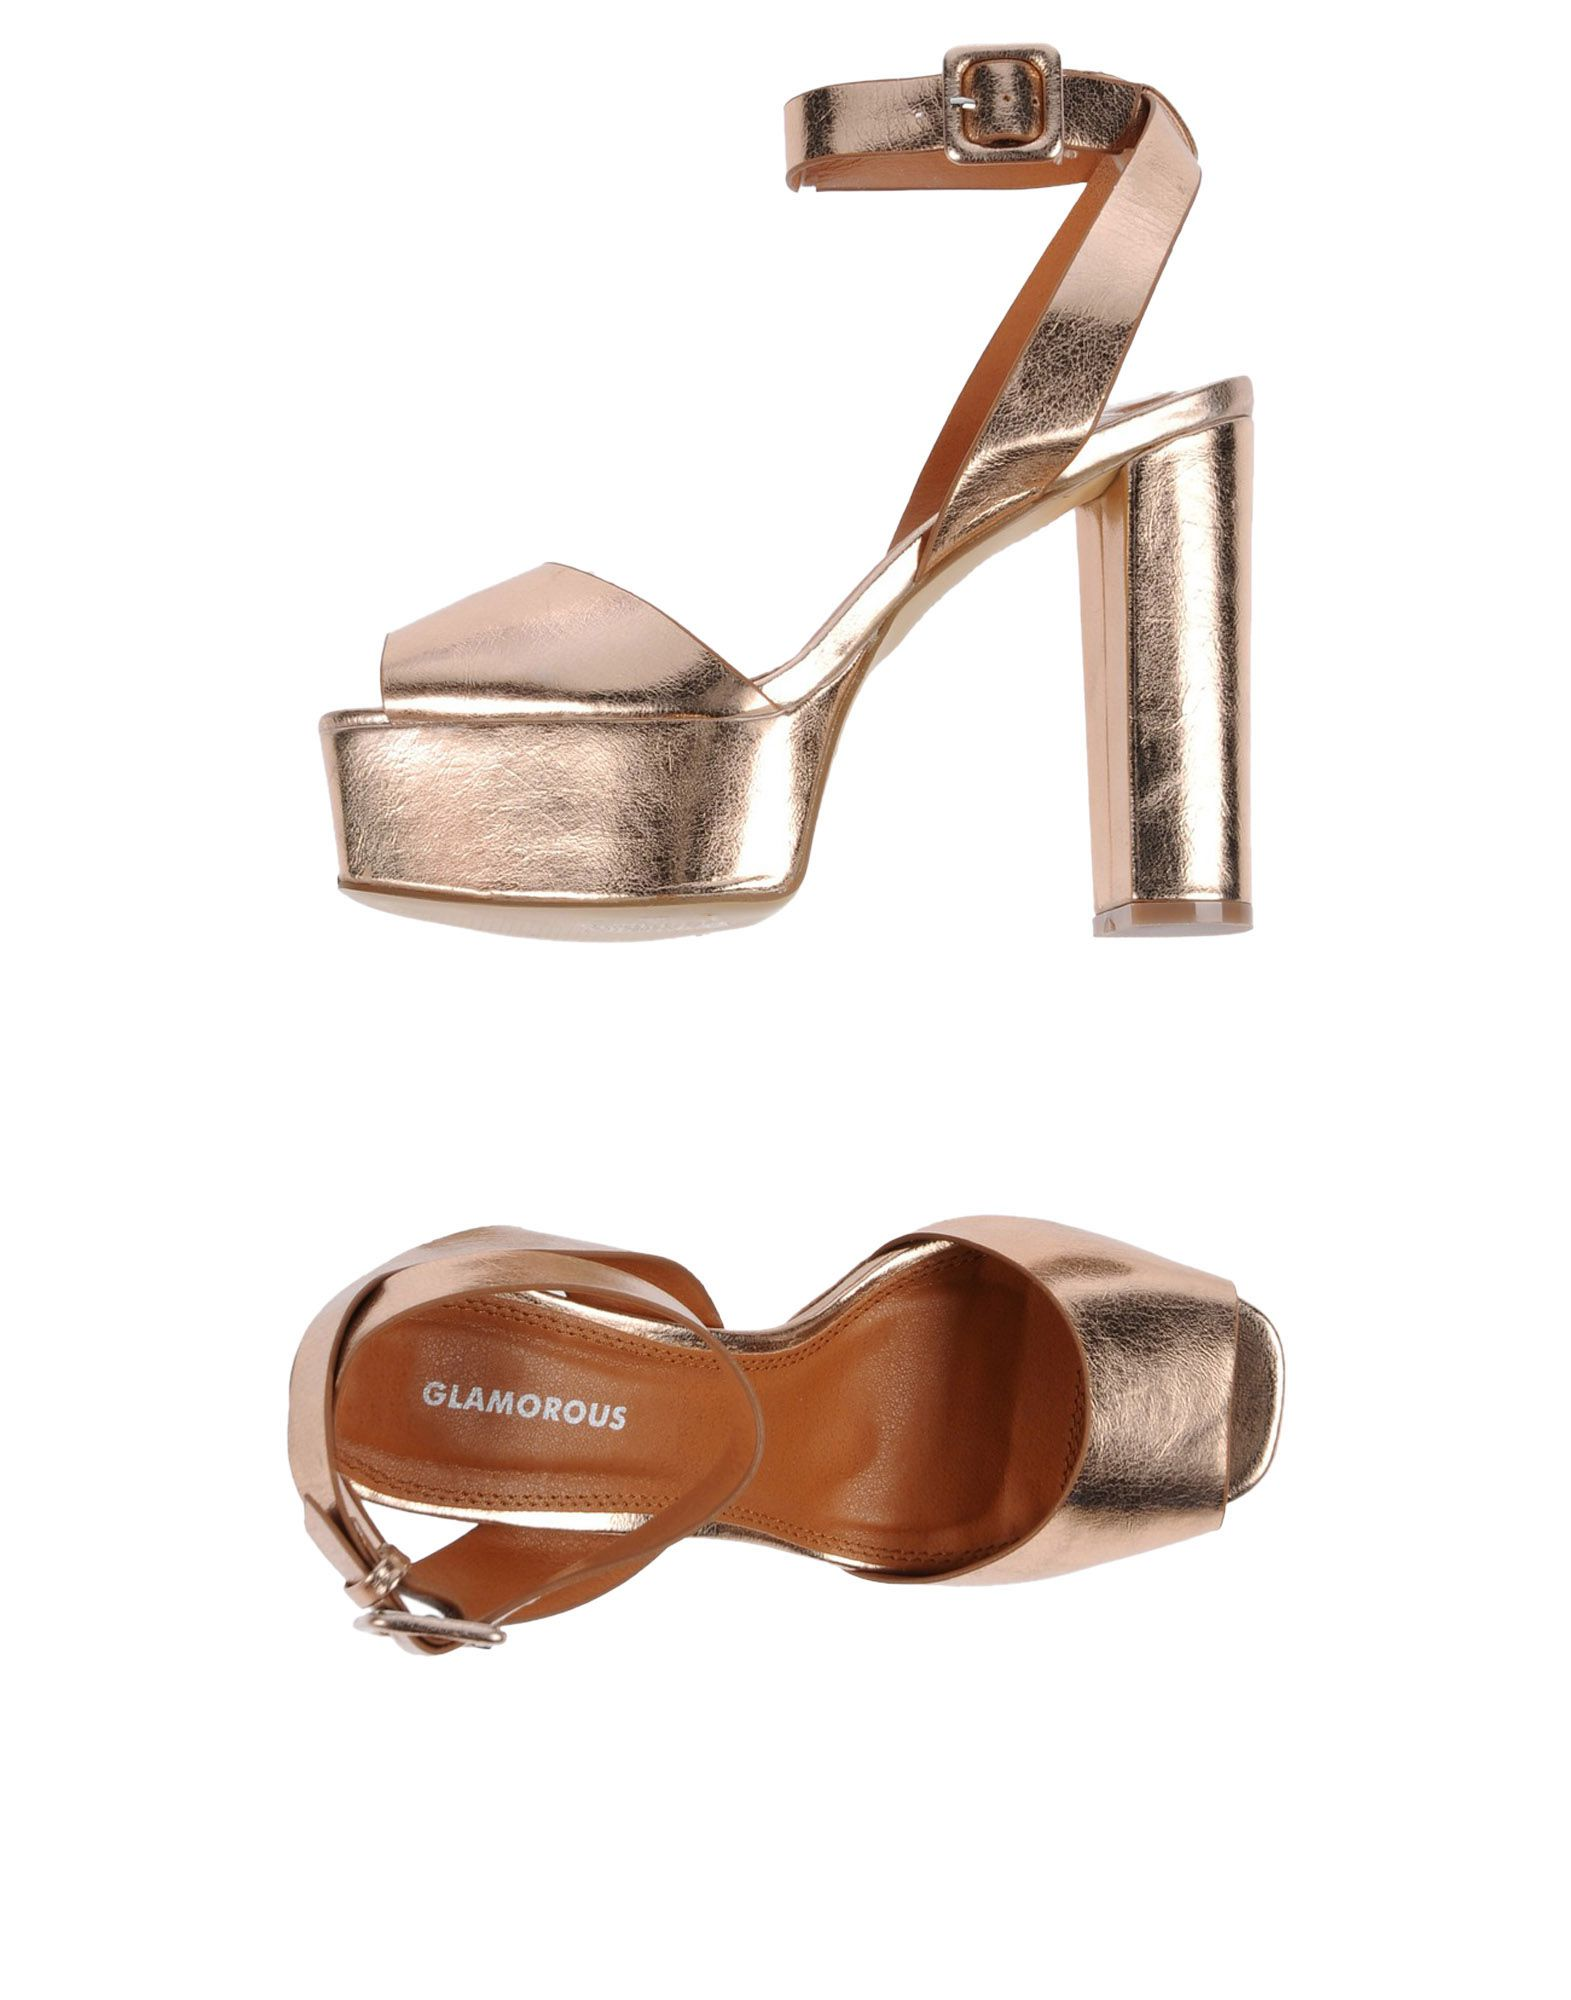 Sandales Glamorous Femme - Sandales Glamorous sur